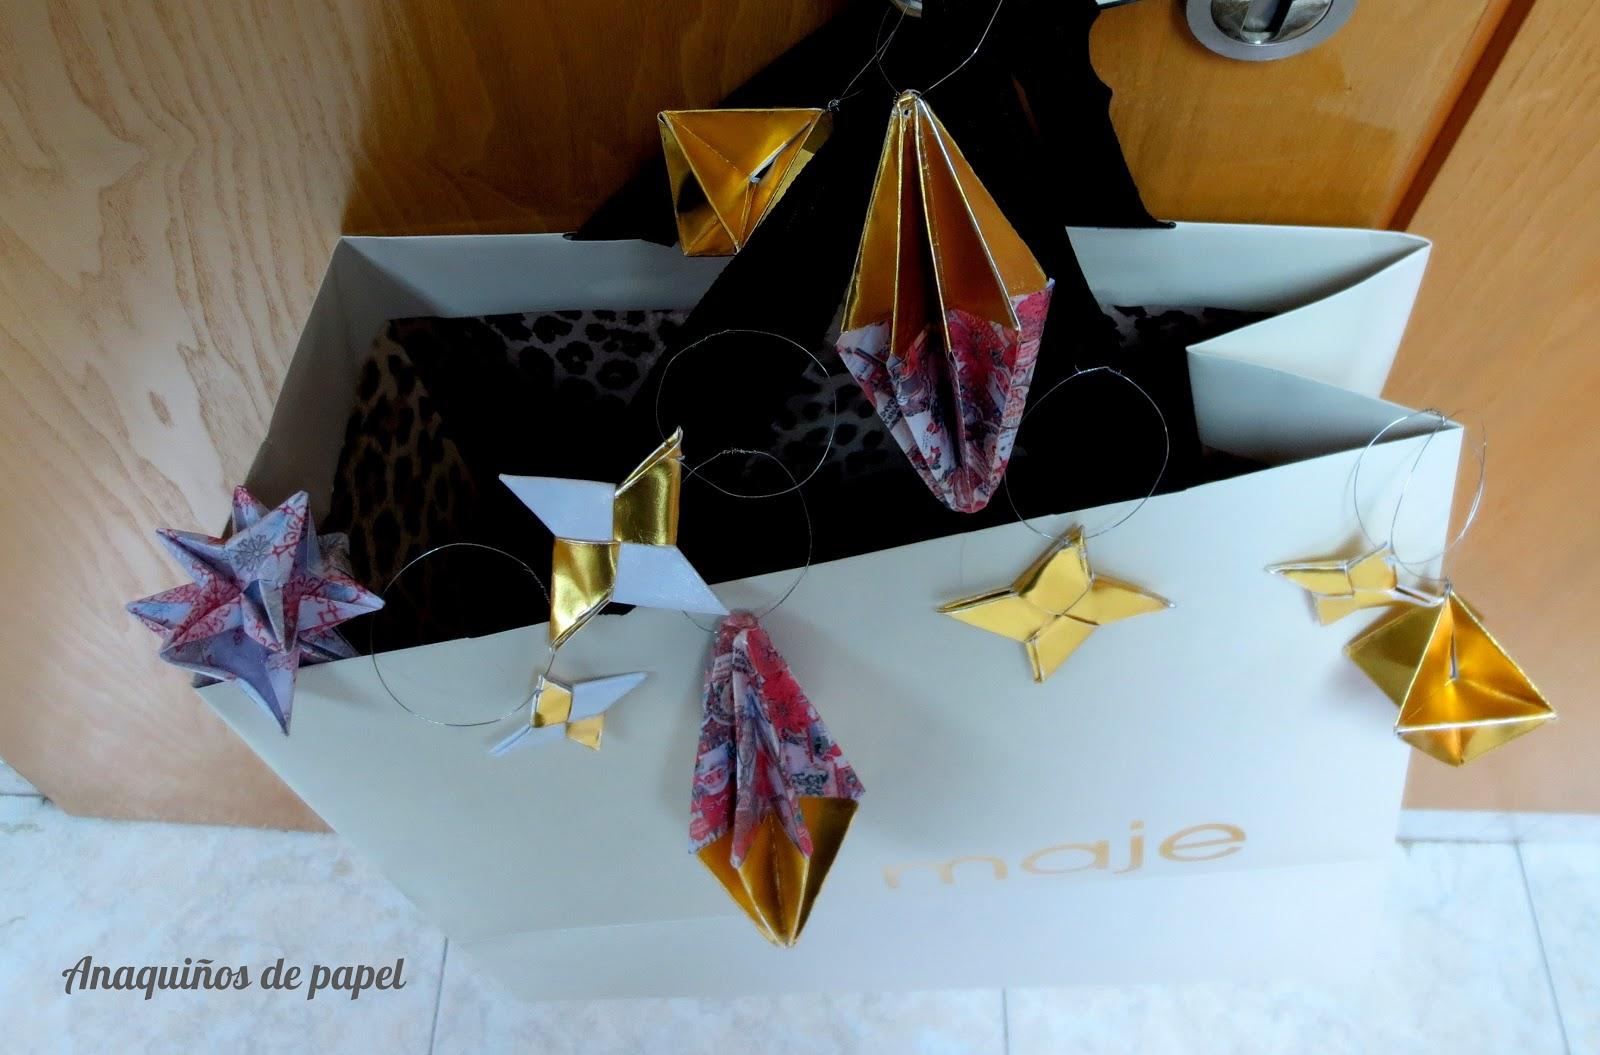 Anaqui os de papel adornos navide os - Adornos navidenos papel ...